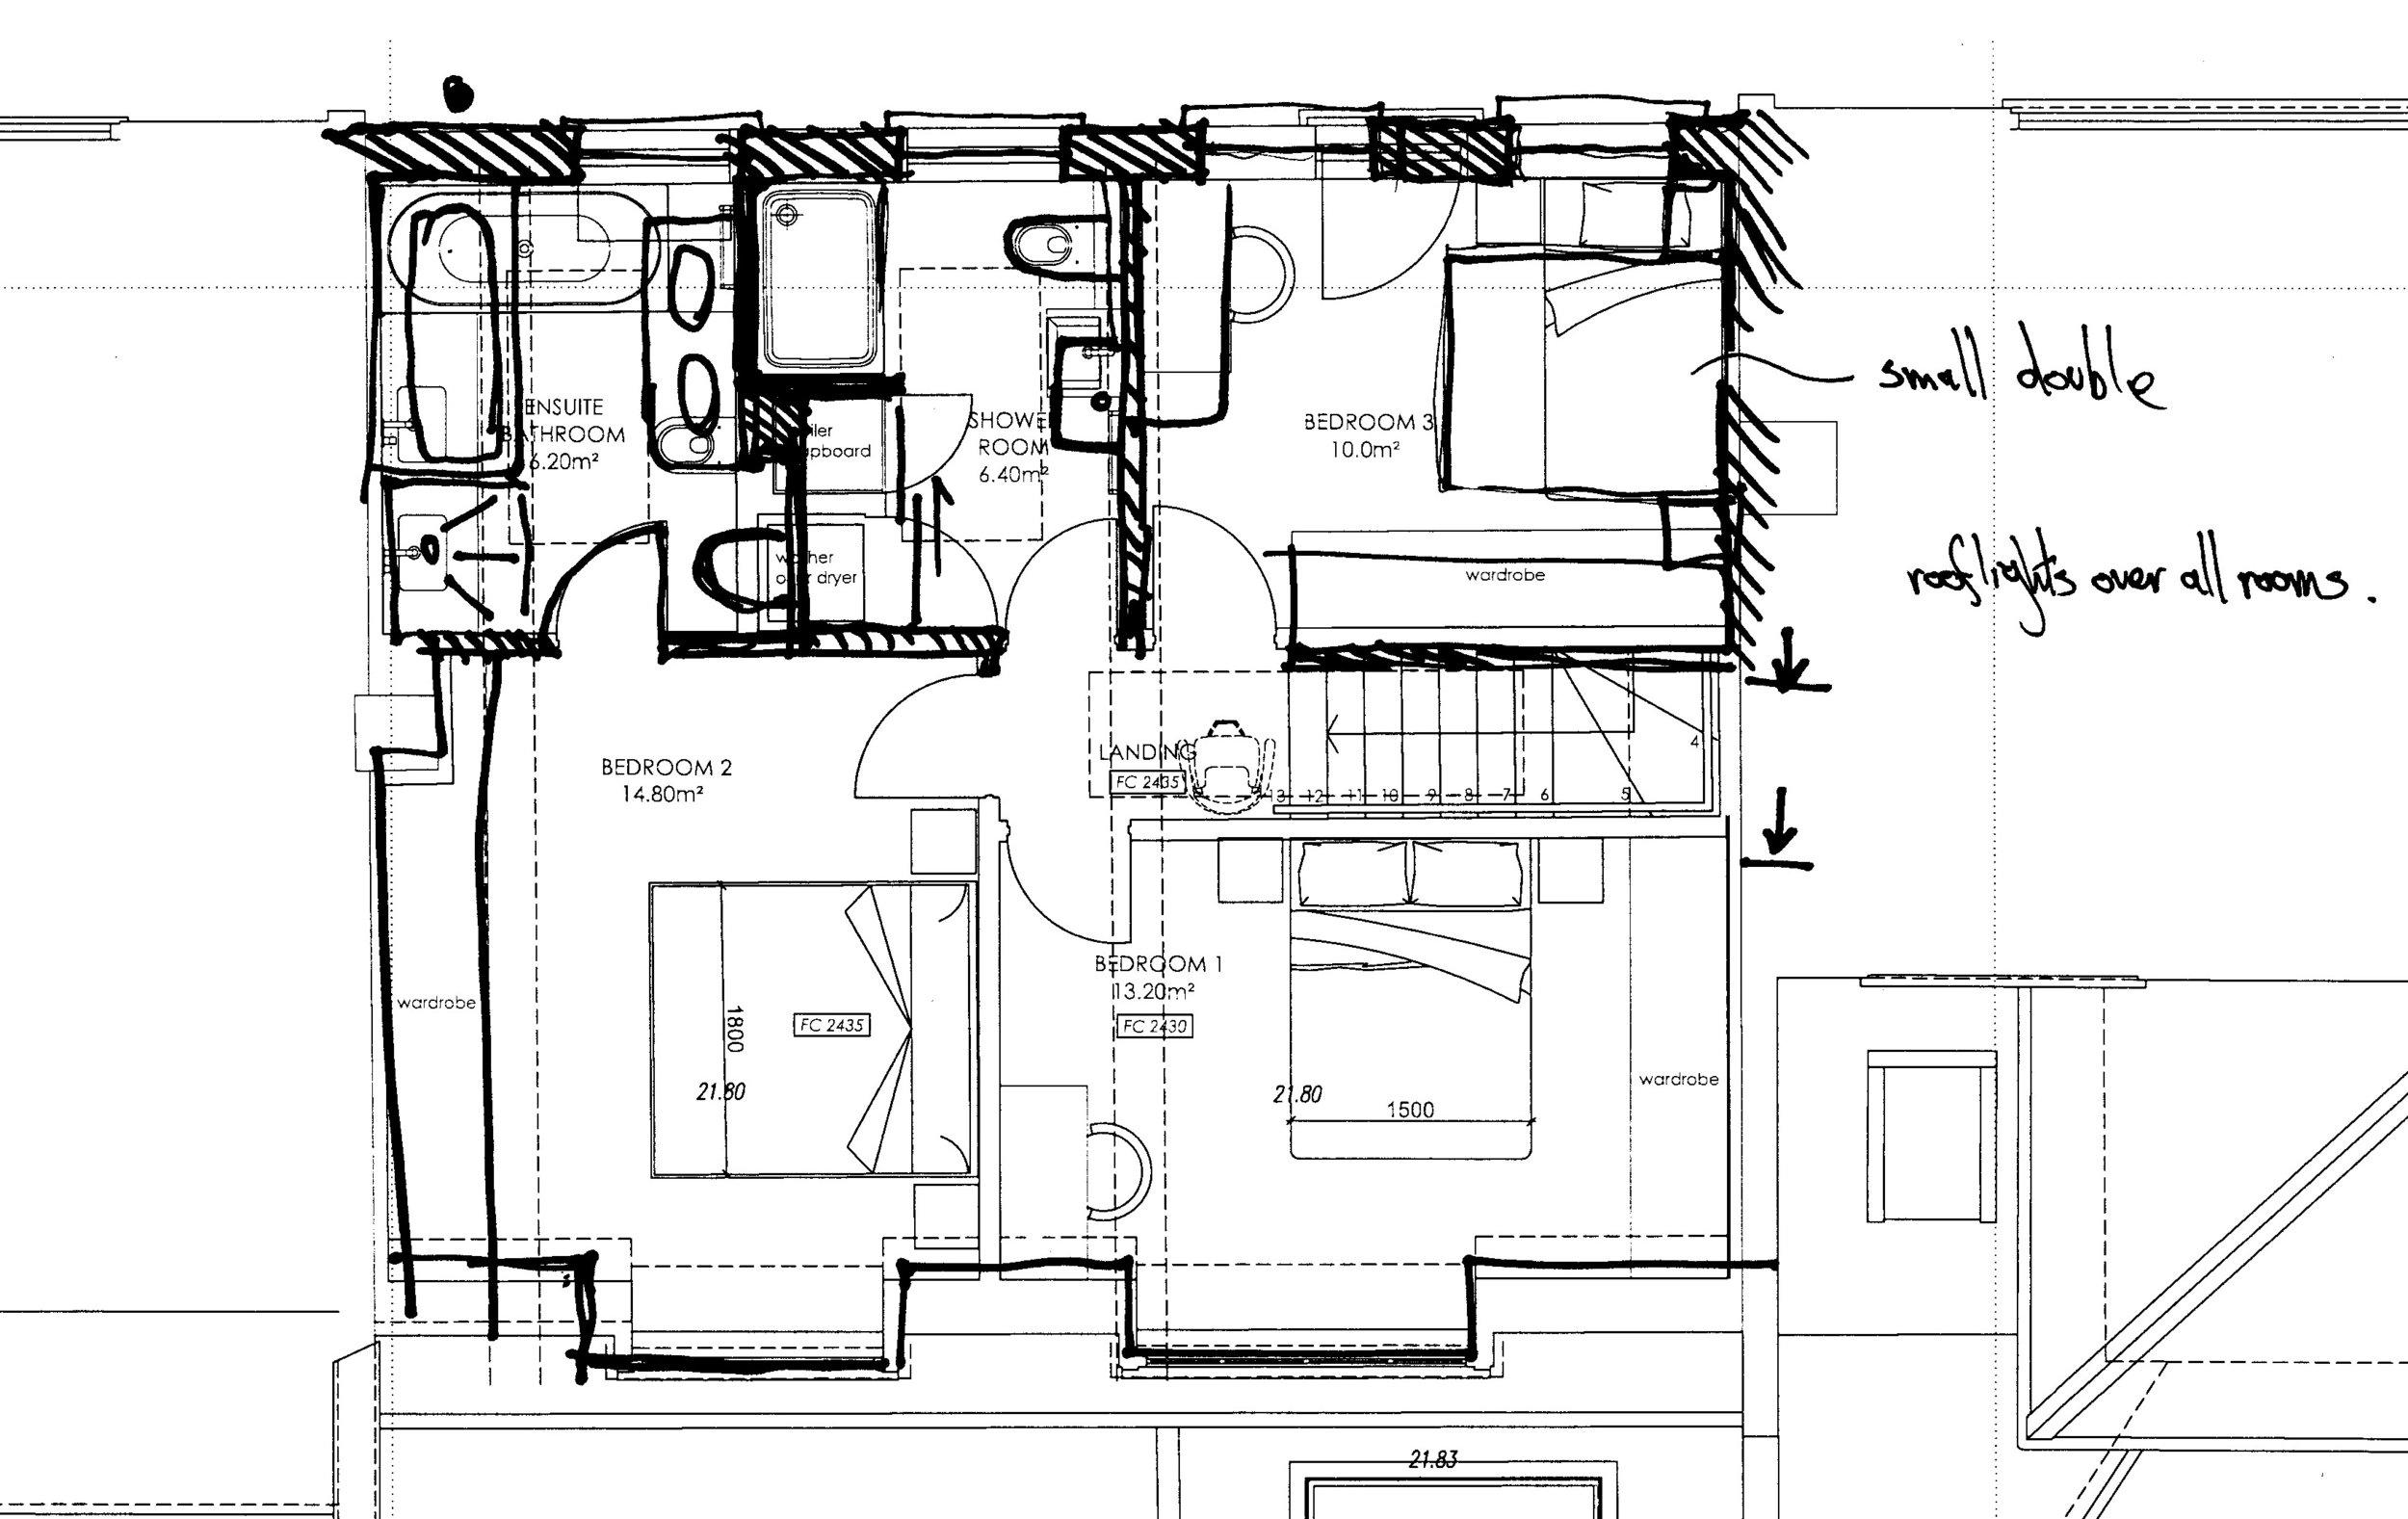 FINEarchitecture_CampdenStreet_Sketch3.jpg